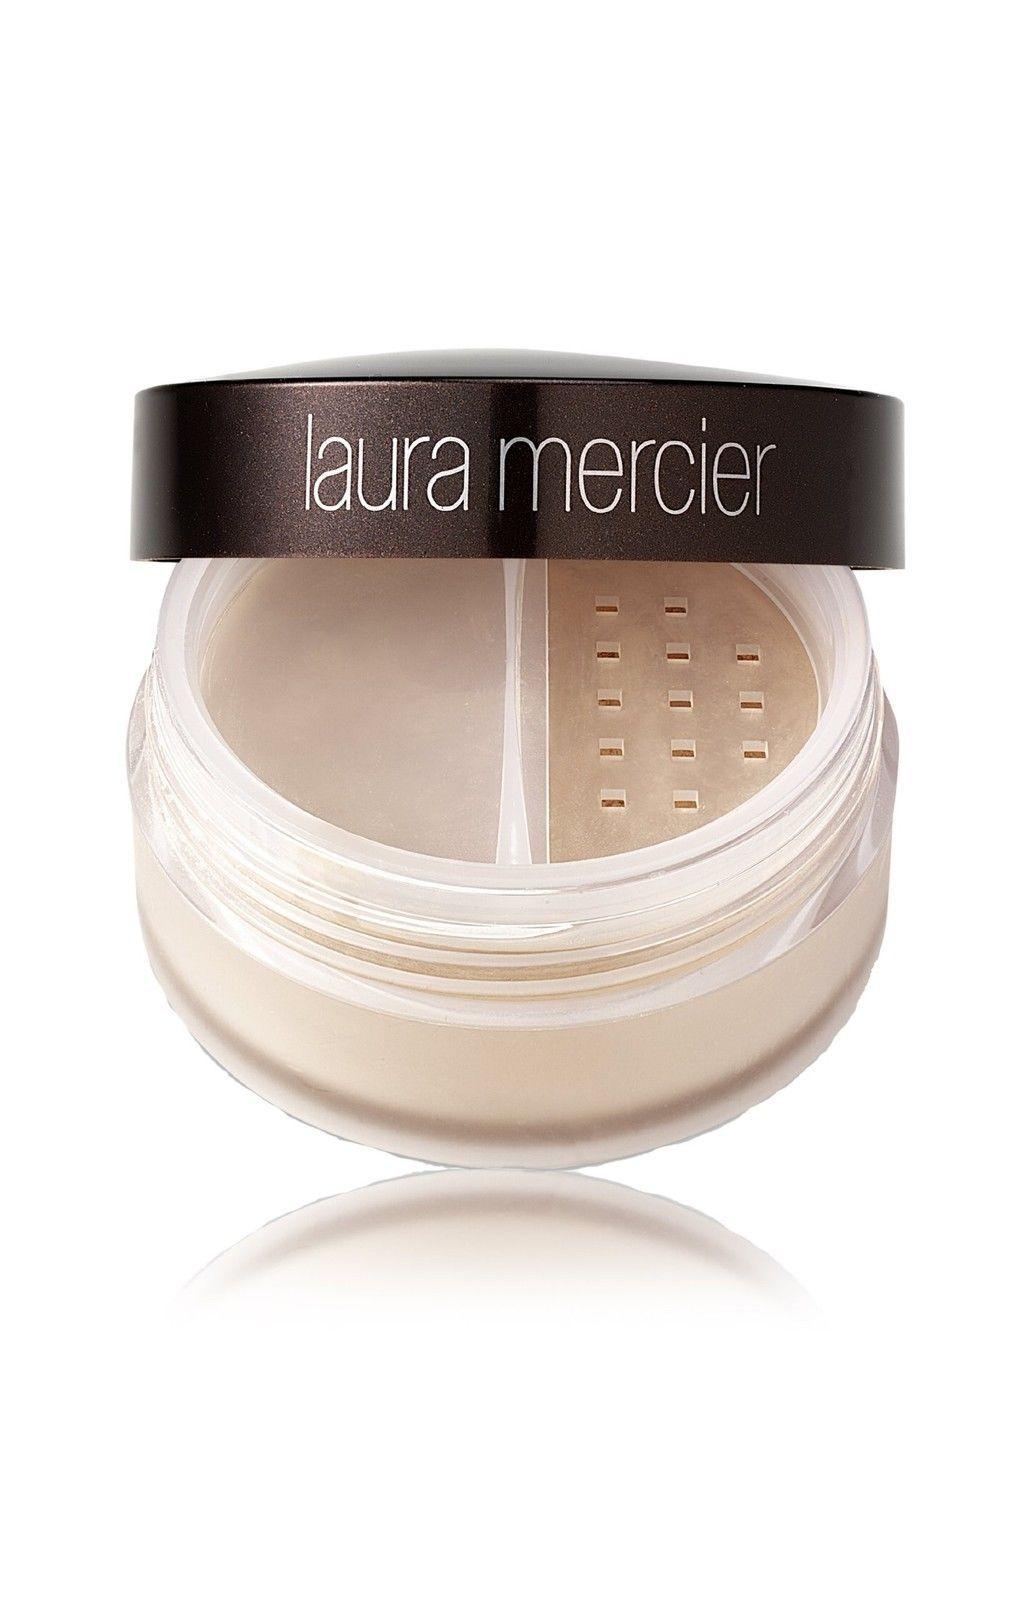 Laura Mercier Loose Setting Powder Translucent - #2  Fast Same Day Shipping! - $32.99